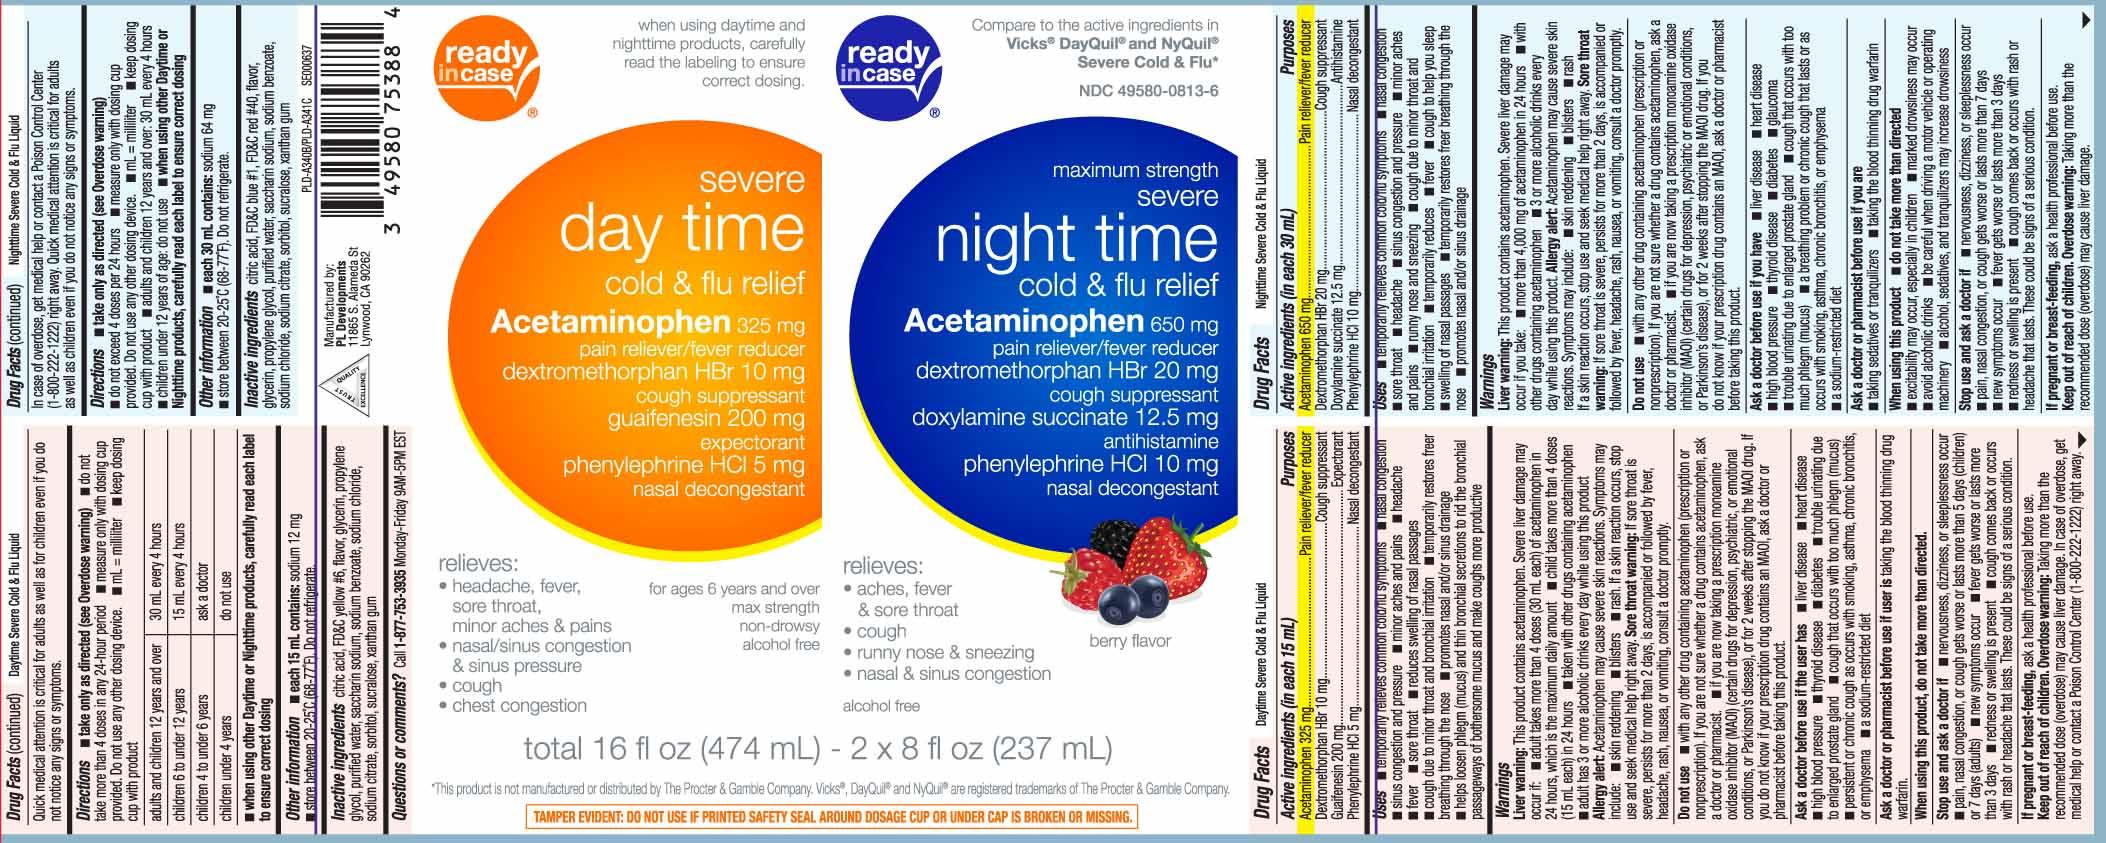 Acetaminophen 325 mg, Dextromethorphan HBr 10 mg, Guaifenesin 200 mg, Phenylephrine HCl 5 mg, Acetaminophen 650 mg, Dextromethorphan HBr 20 mg, Doxylamine Succinate 12.5 mg, Phenylephrine HCl 10 mg